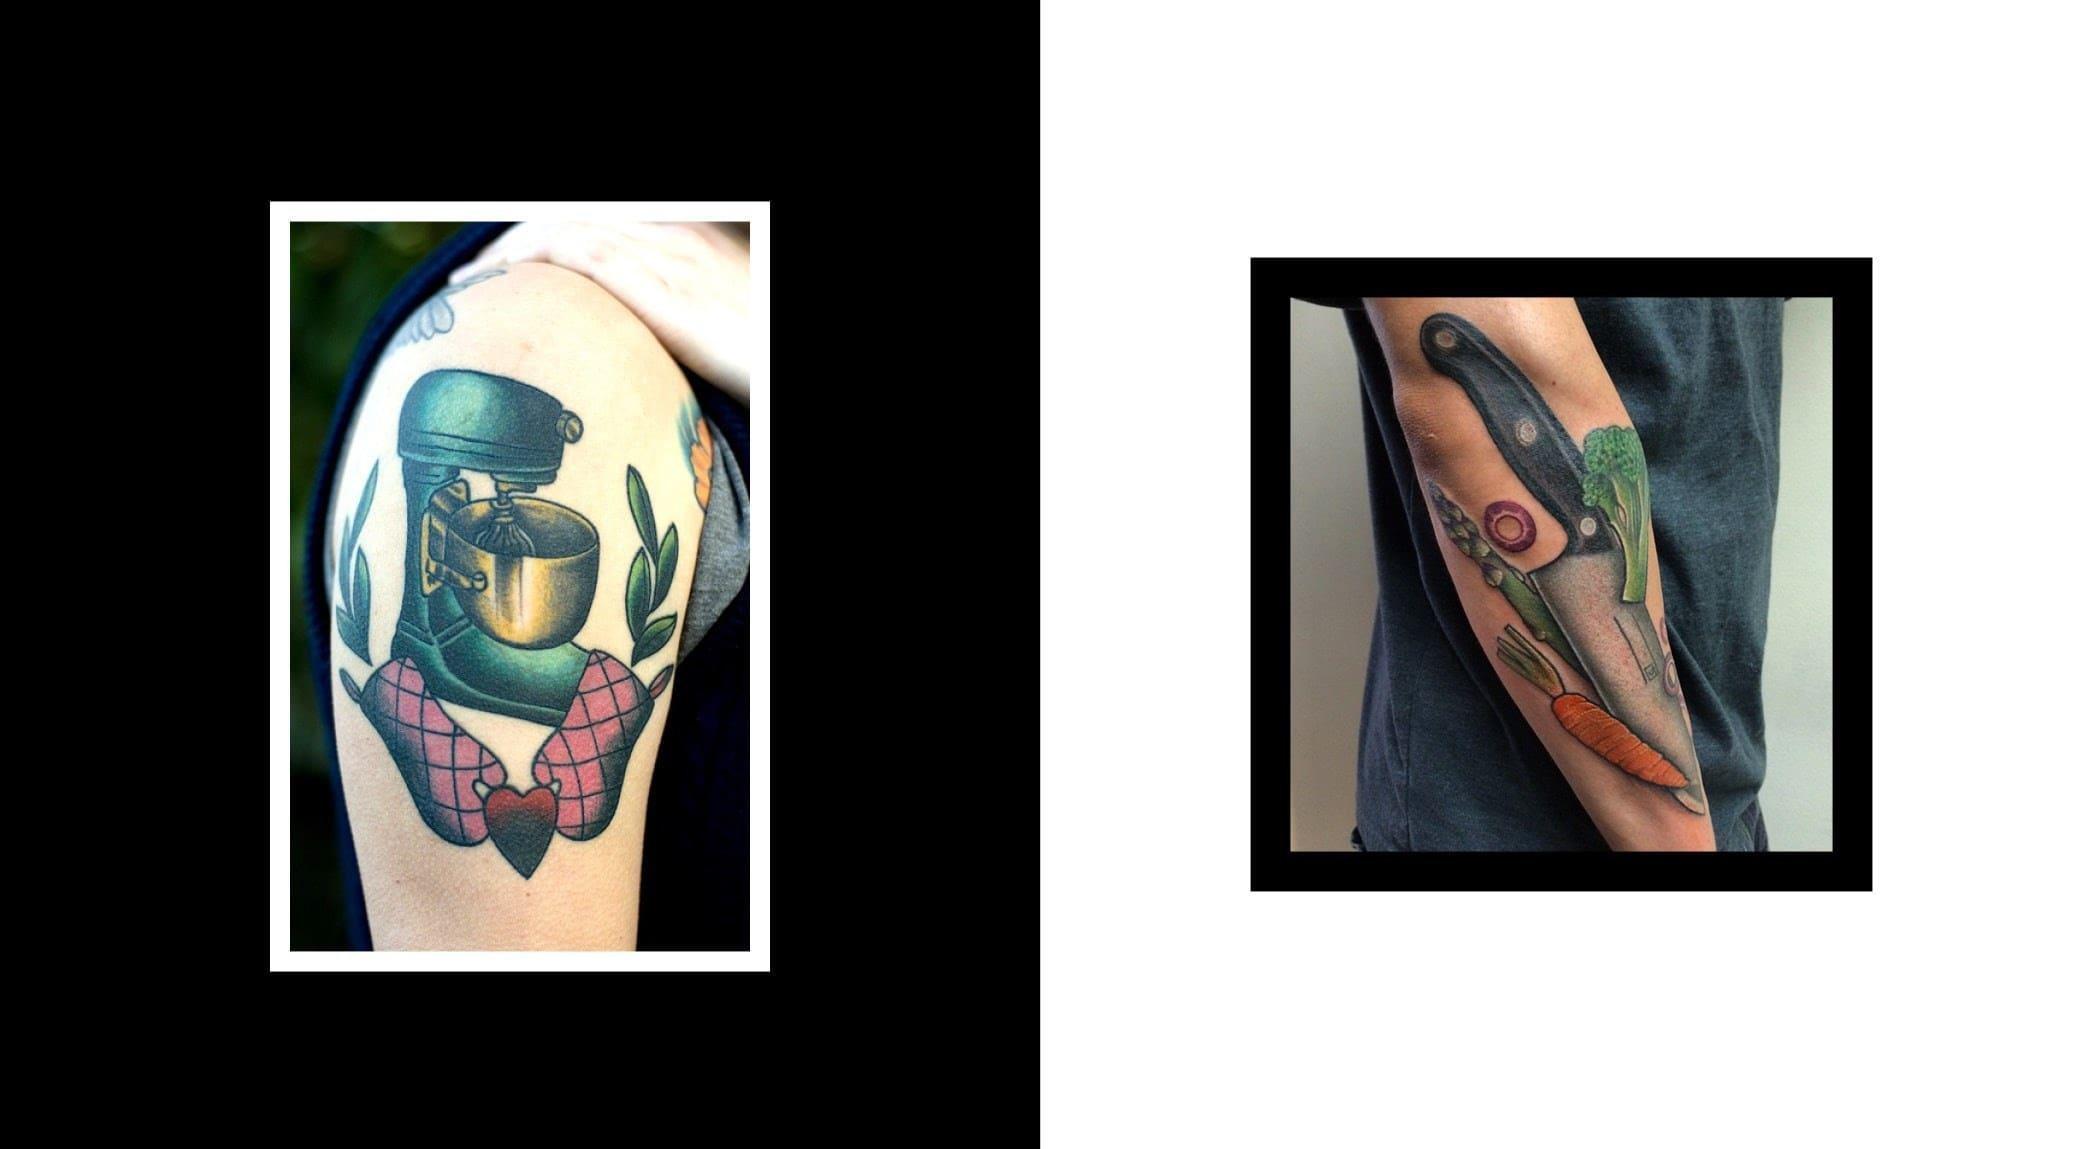 original_010-tattoo-finedininglovers10.jpg